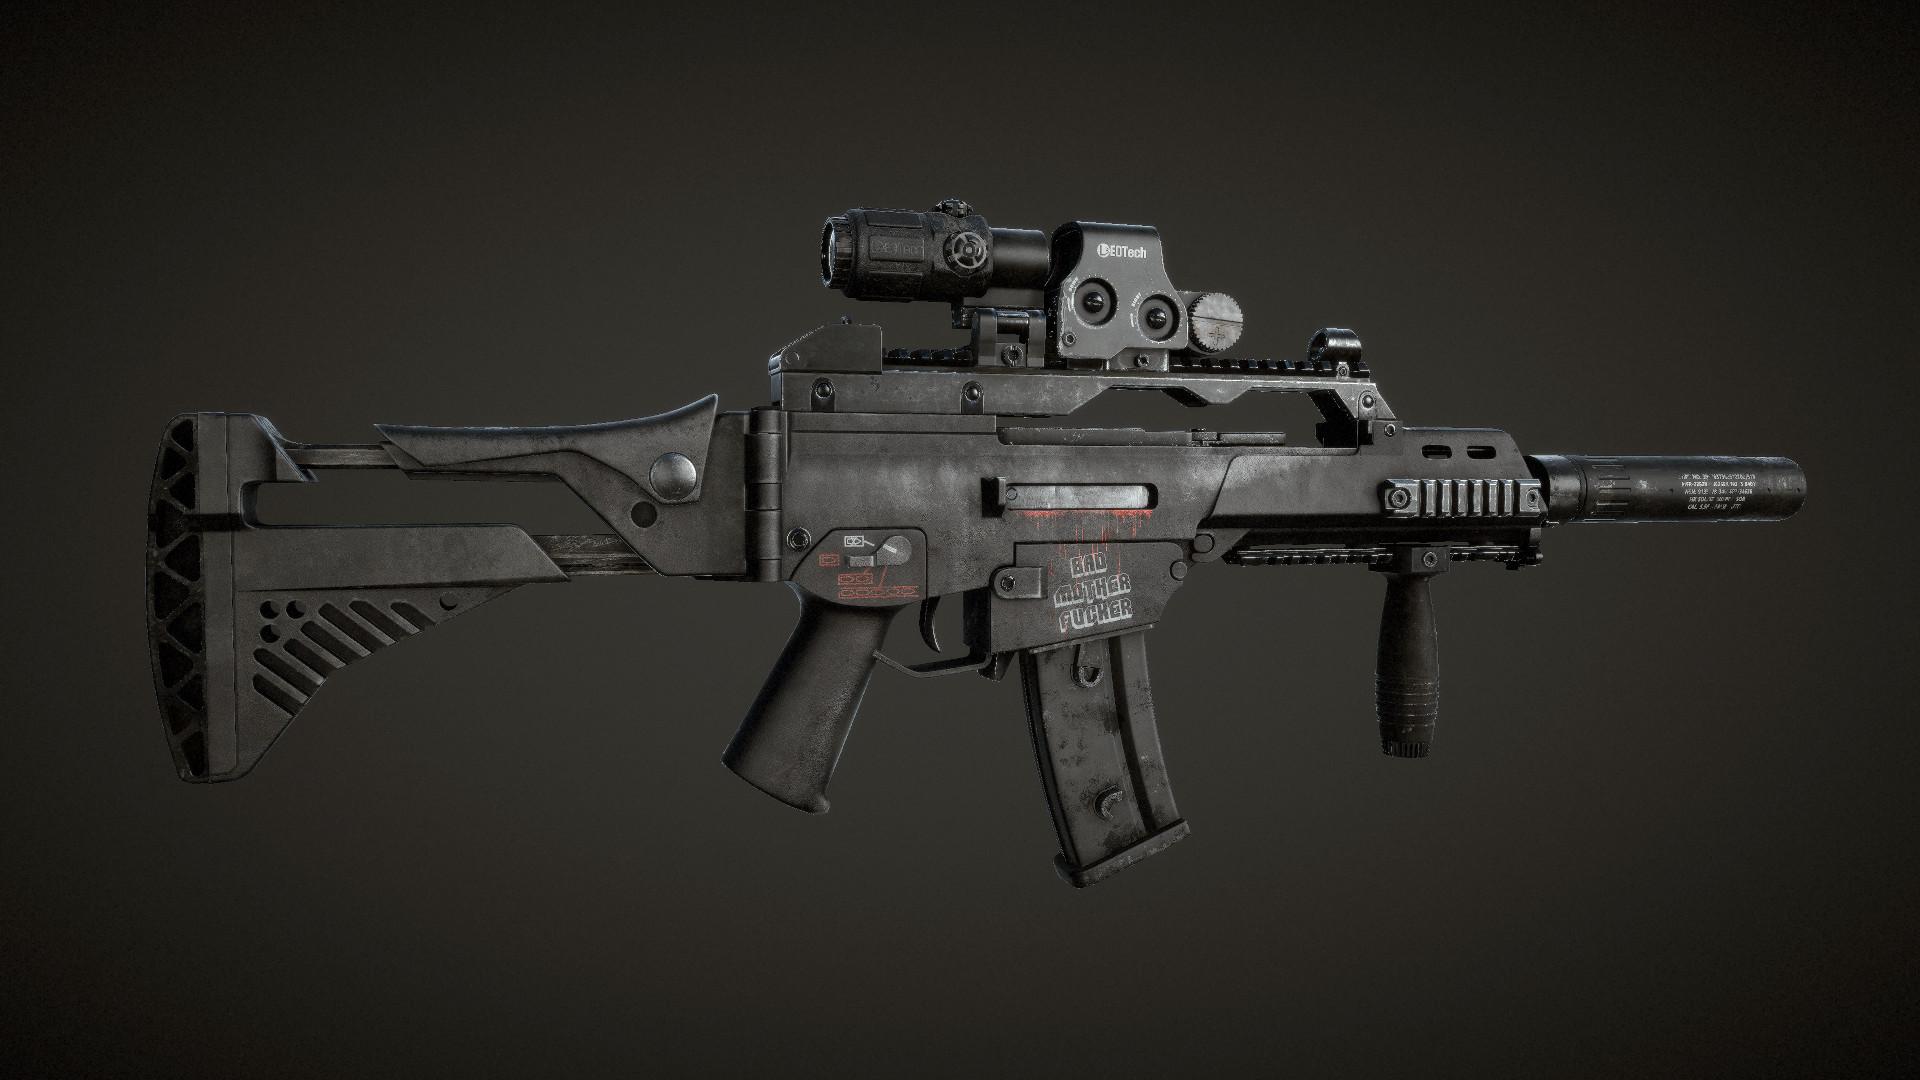 P 233 Ter Gazs 243 Hk G36c Rifle